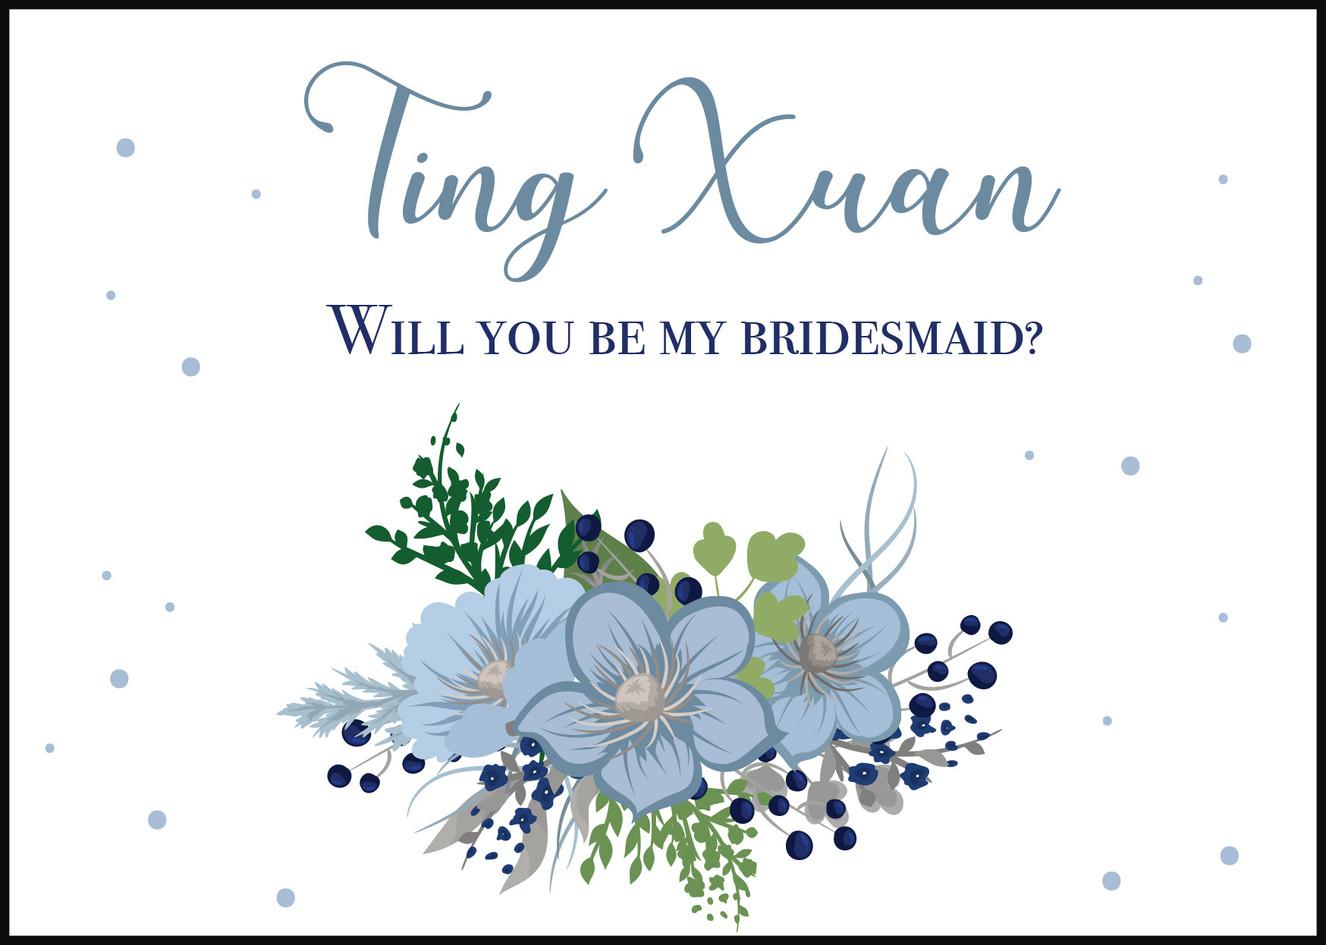 New bridesmaid card 20202.jpg